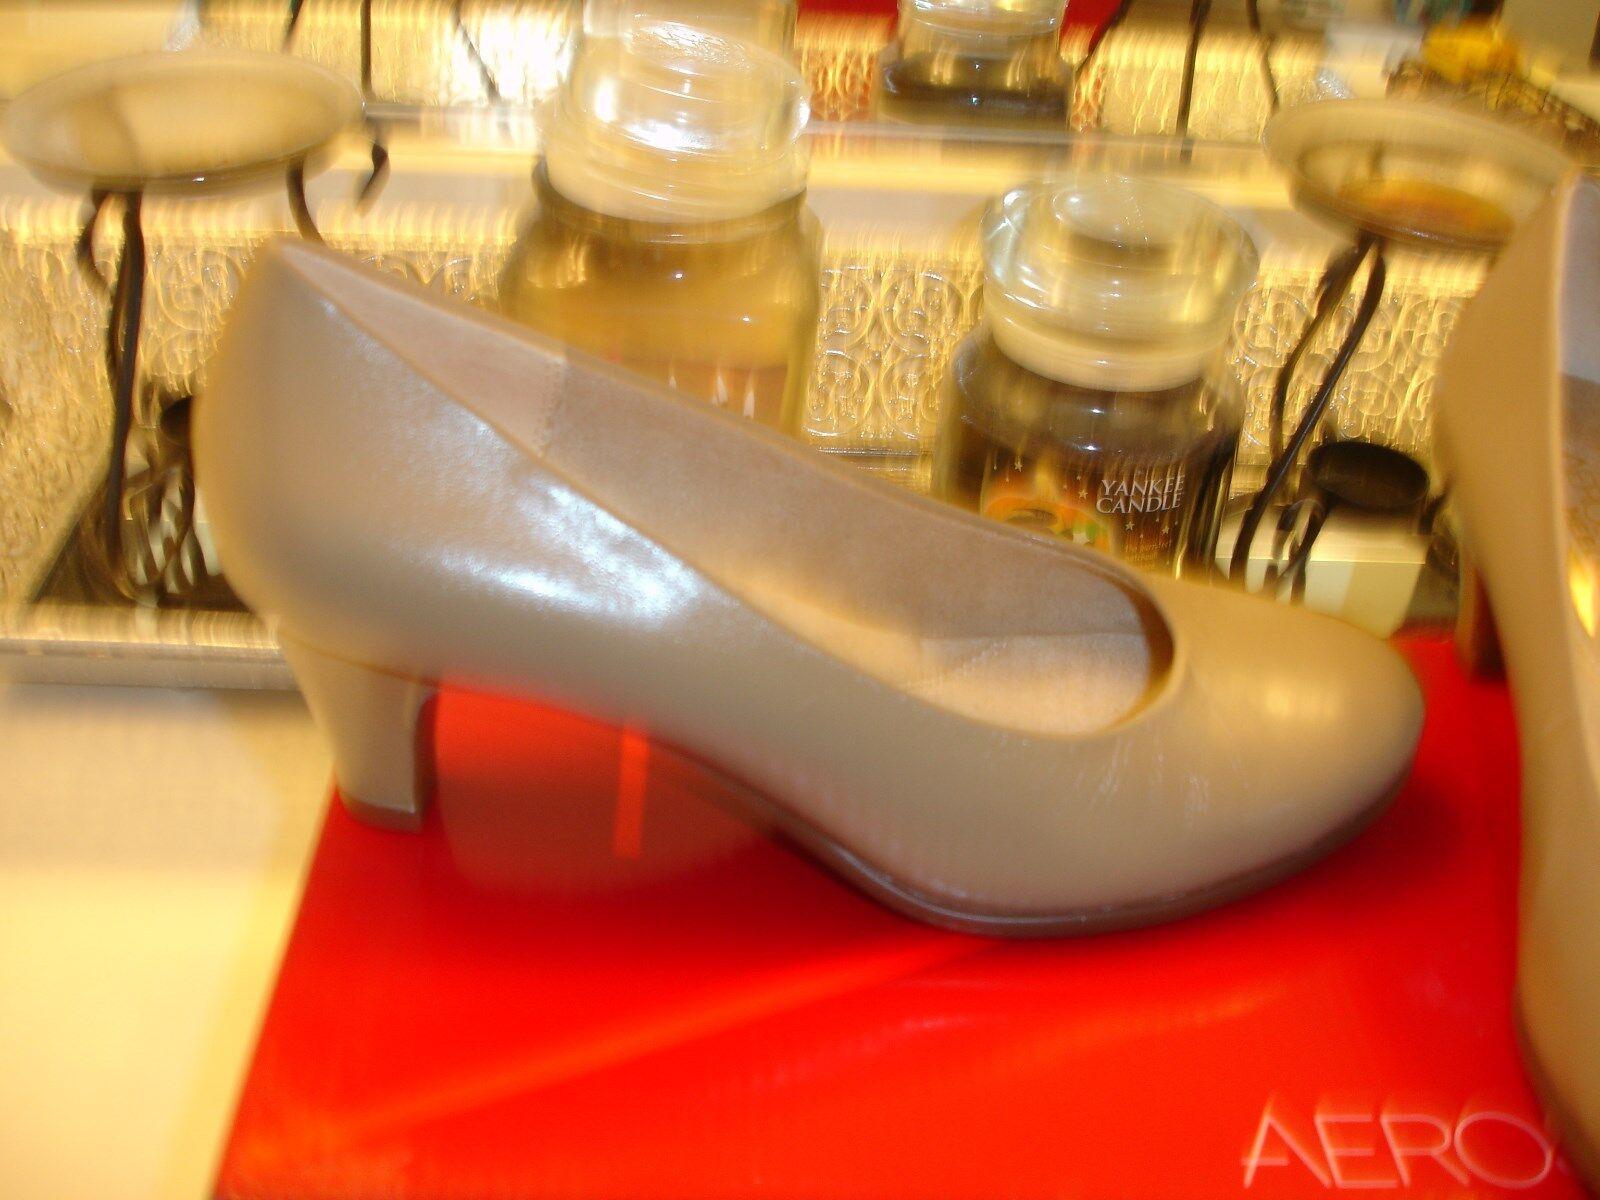 Aerosoles Tan Tan Tan rot Hot Heels Memory Foam Comfort Conservative Taupe 6.5 NWB  89 931c7f